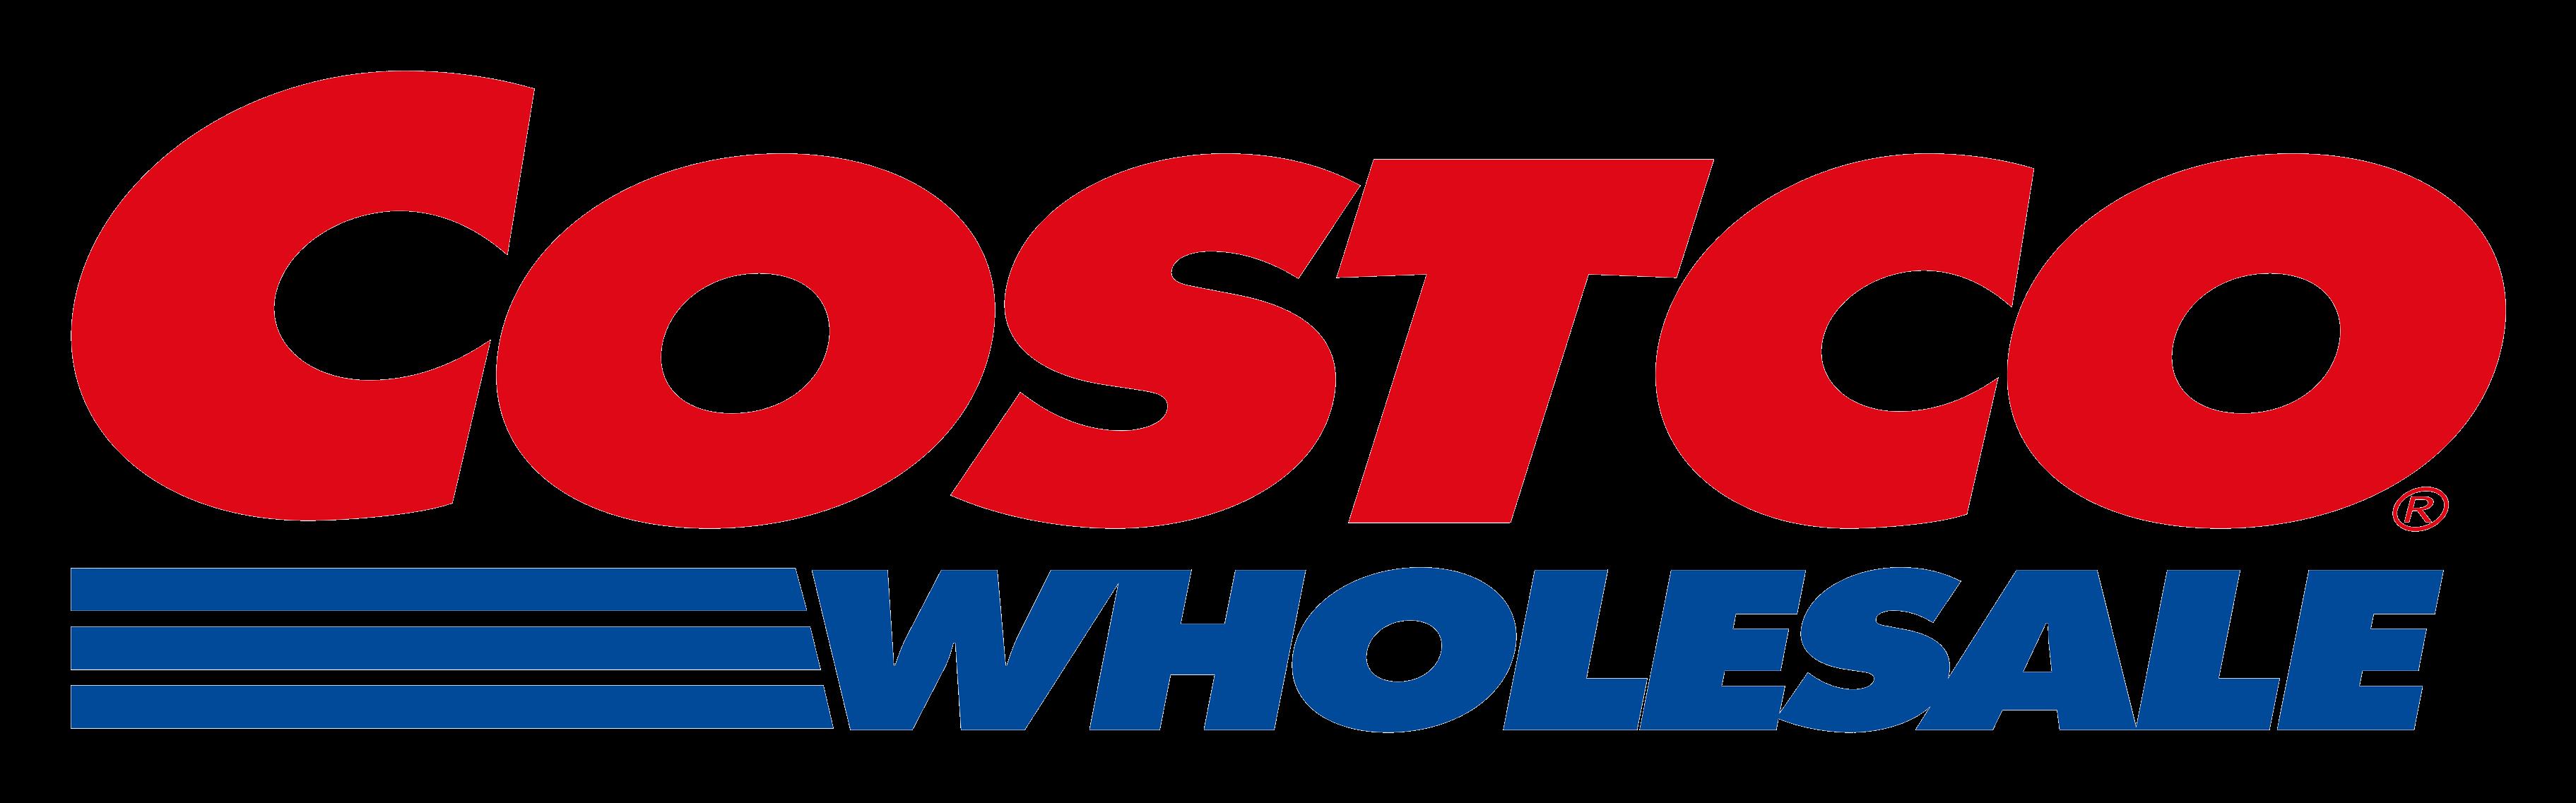 Buy online at Costco